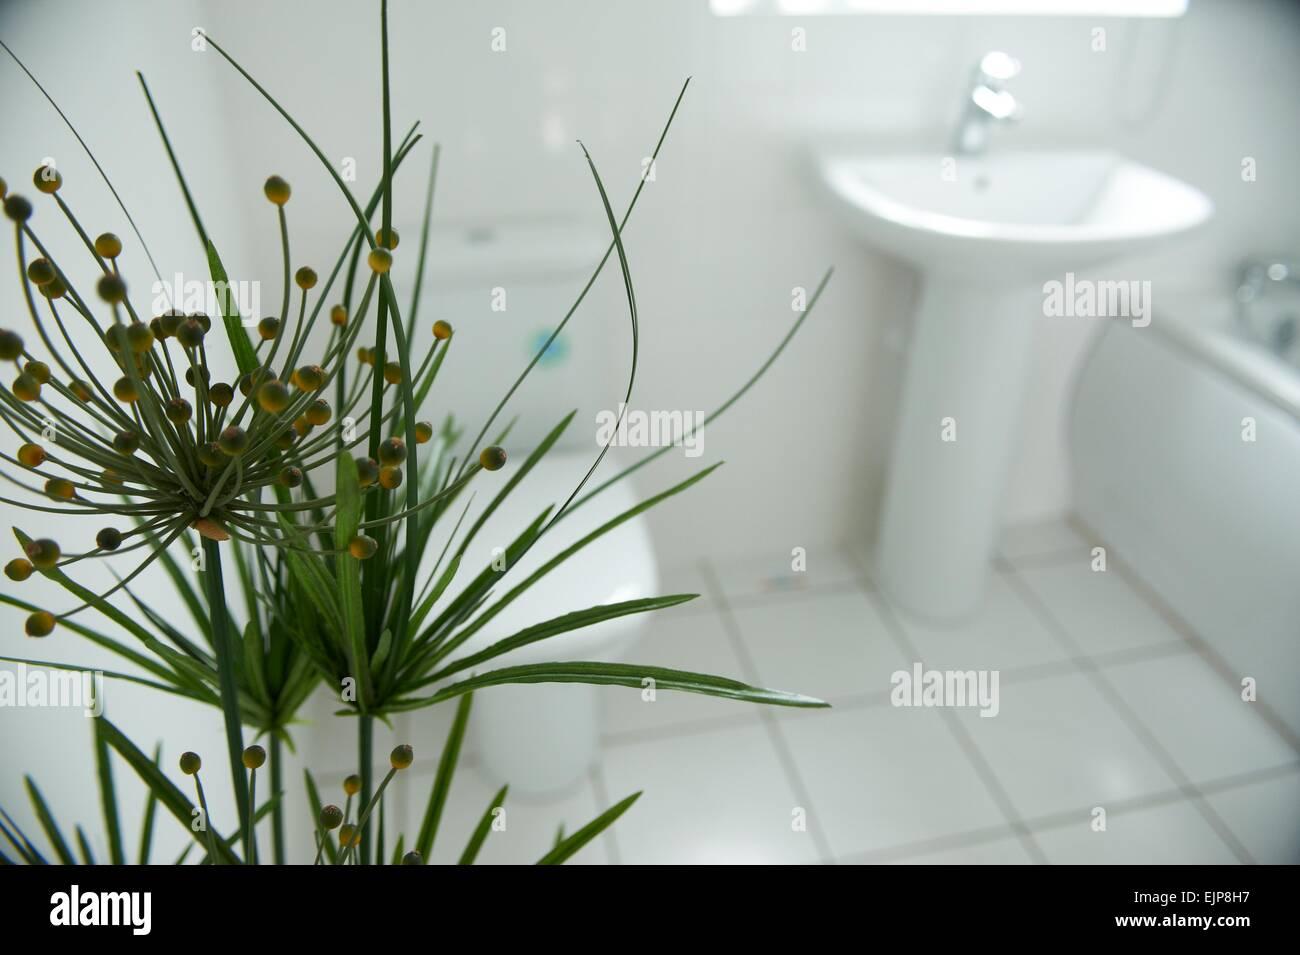 Plante de salle de bain plante salle de bain morne ides pour dcorer sa salle de bain avec des - Plante salle de bain sombre ...